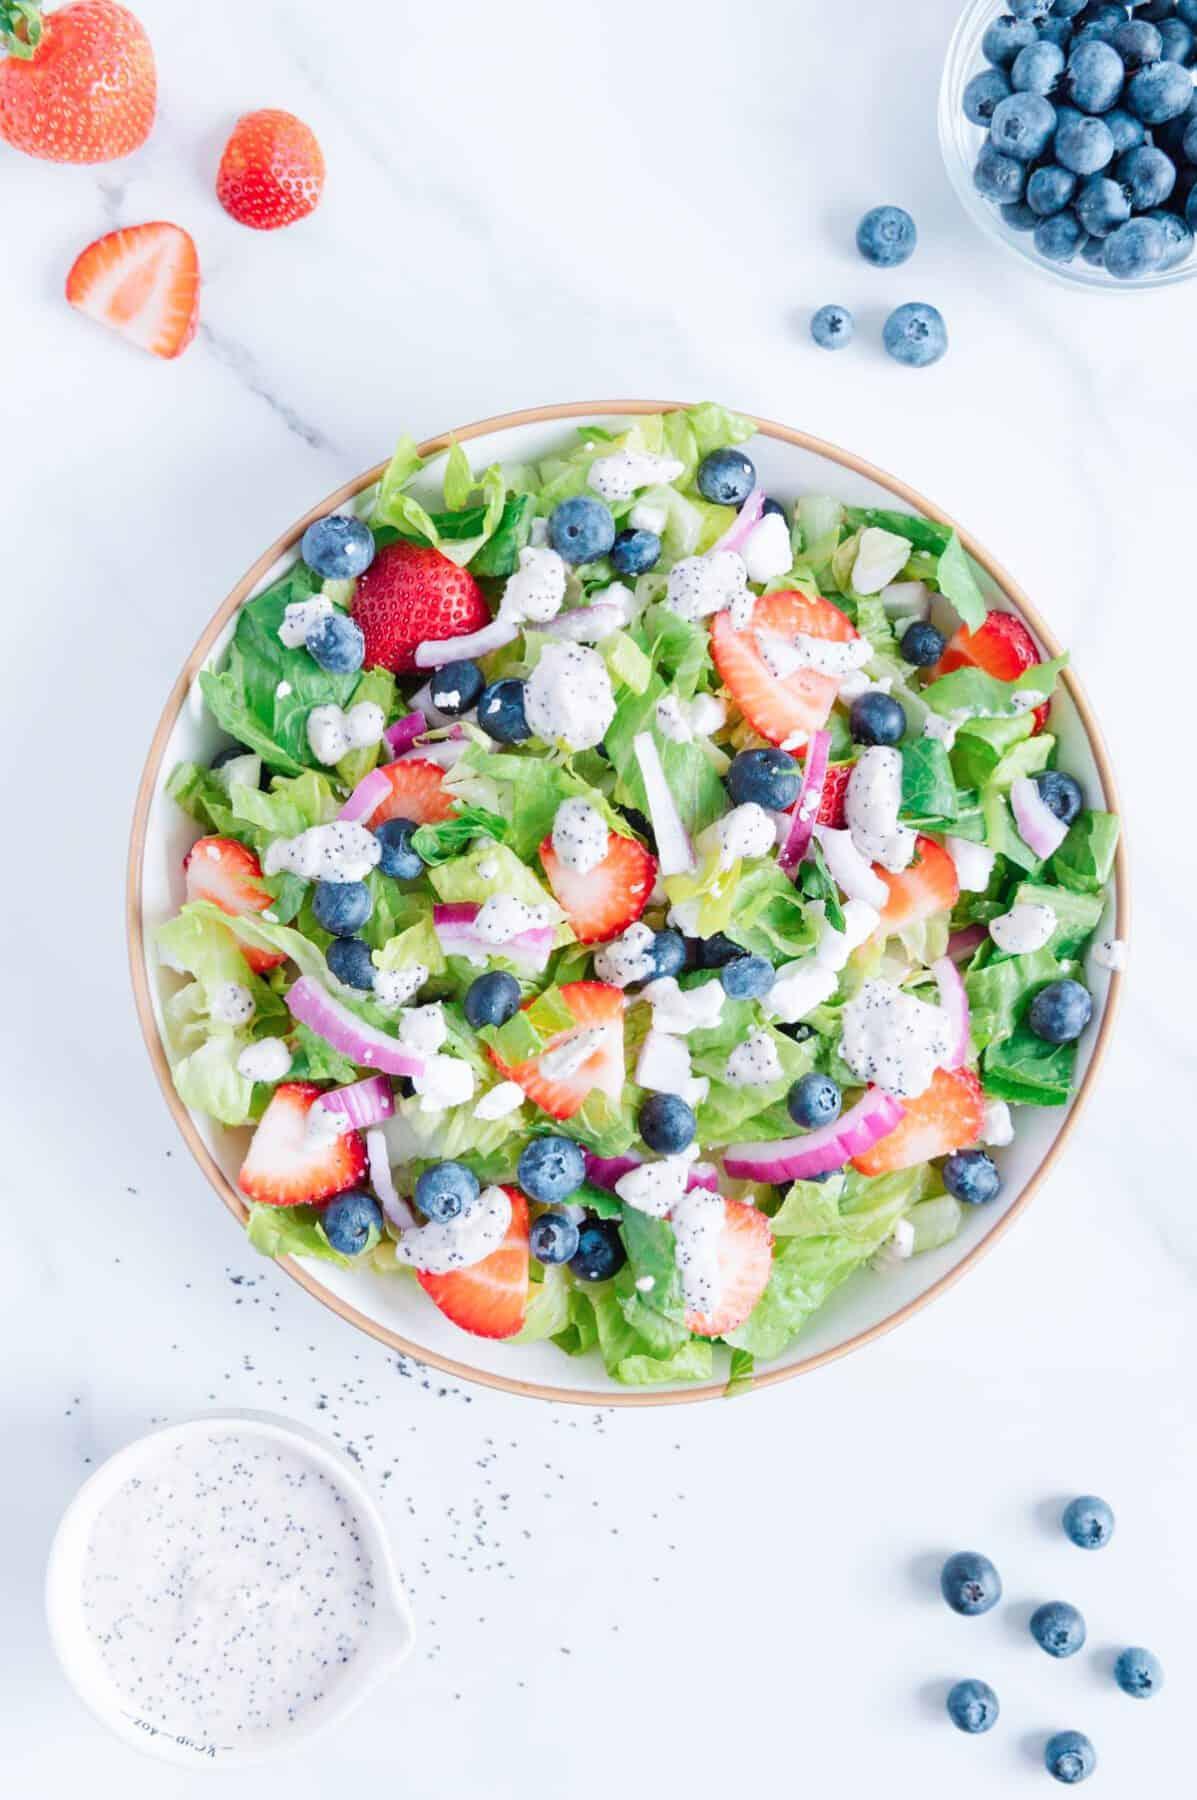 Vegan Strawberry Blueberry Salad